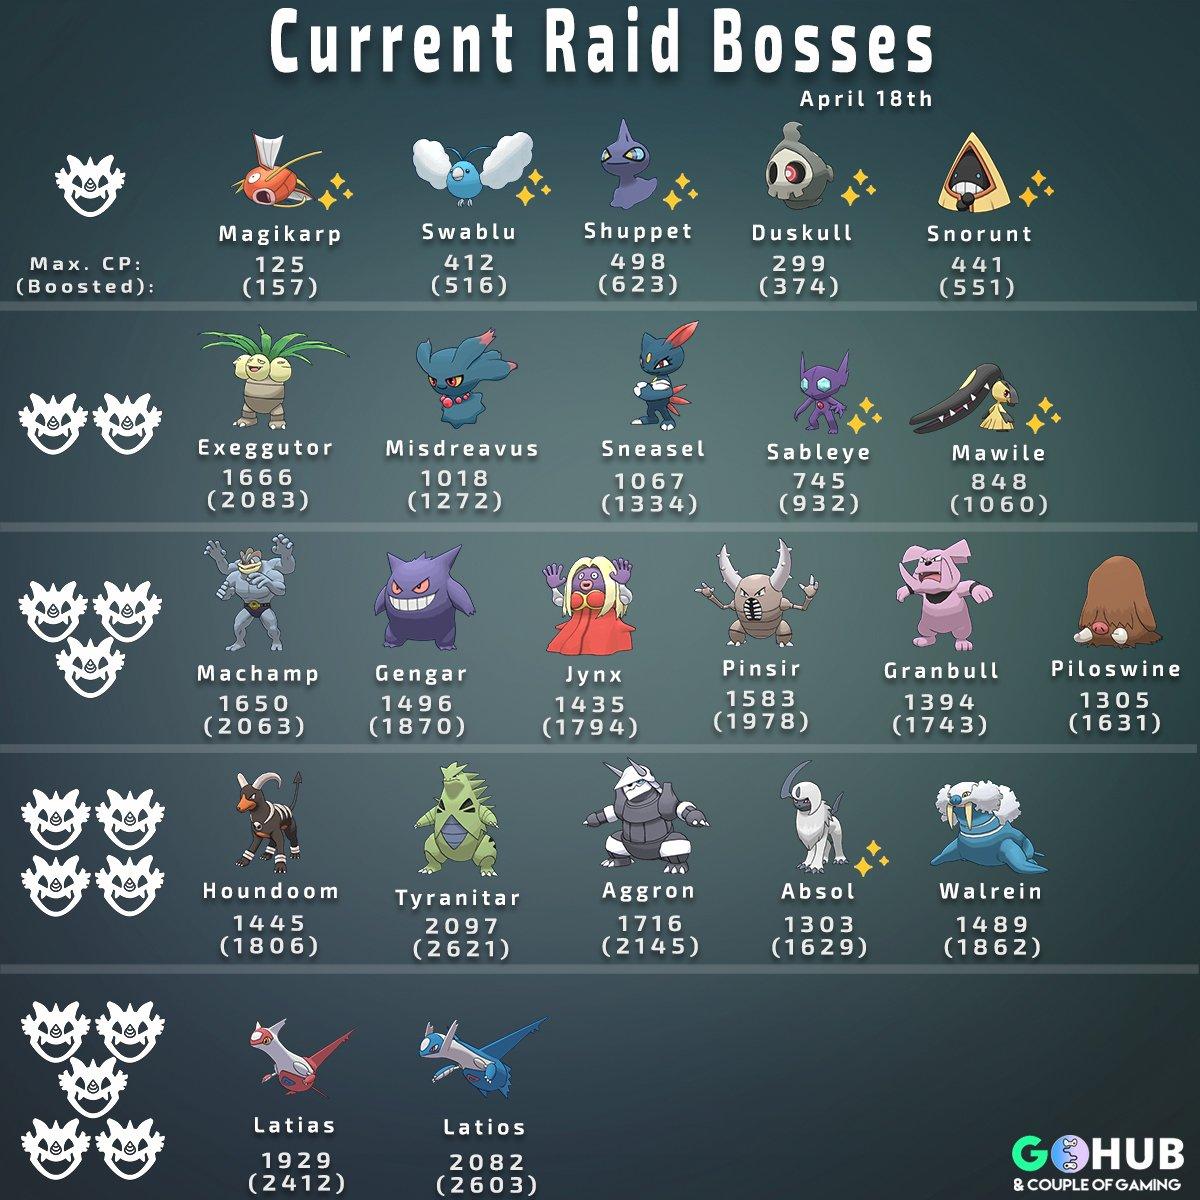 Pokémon GO Hub Twitterren: